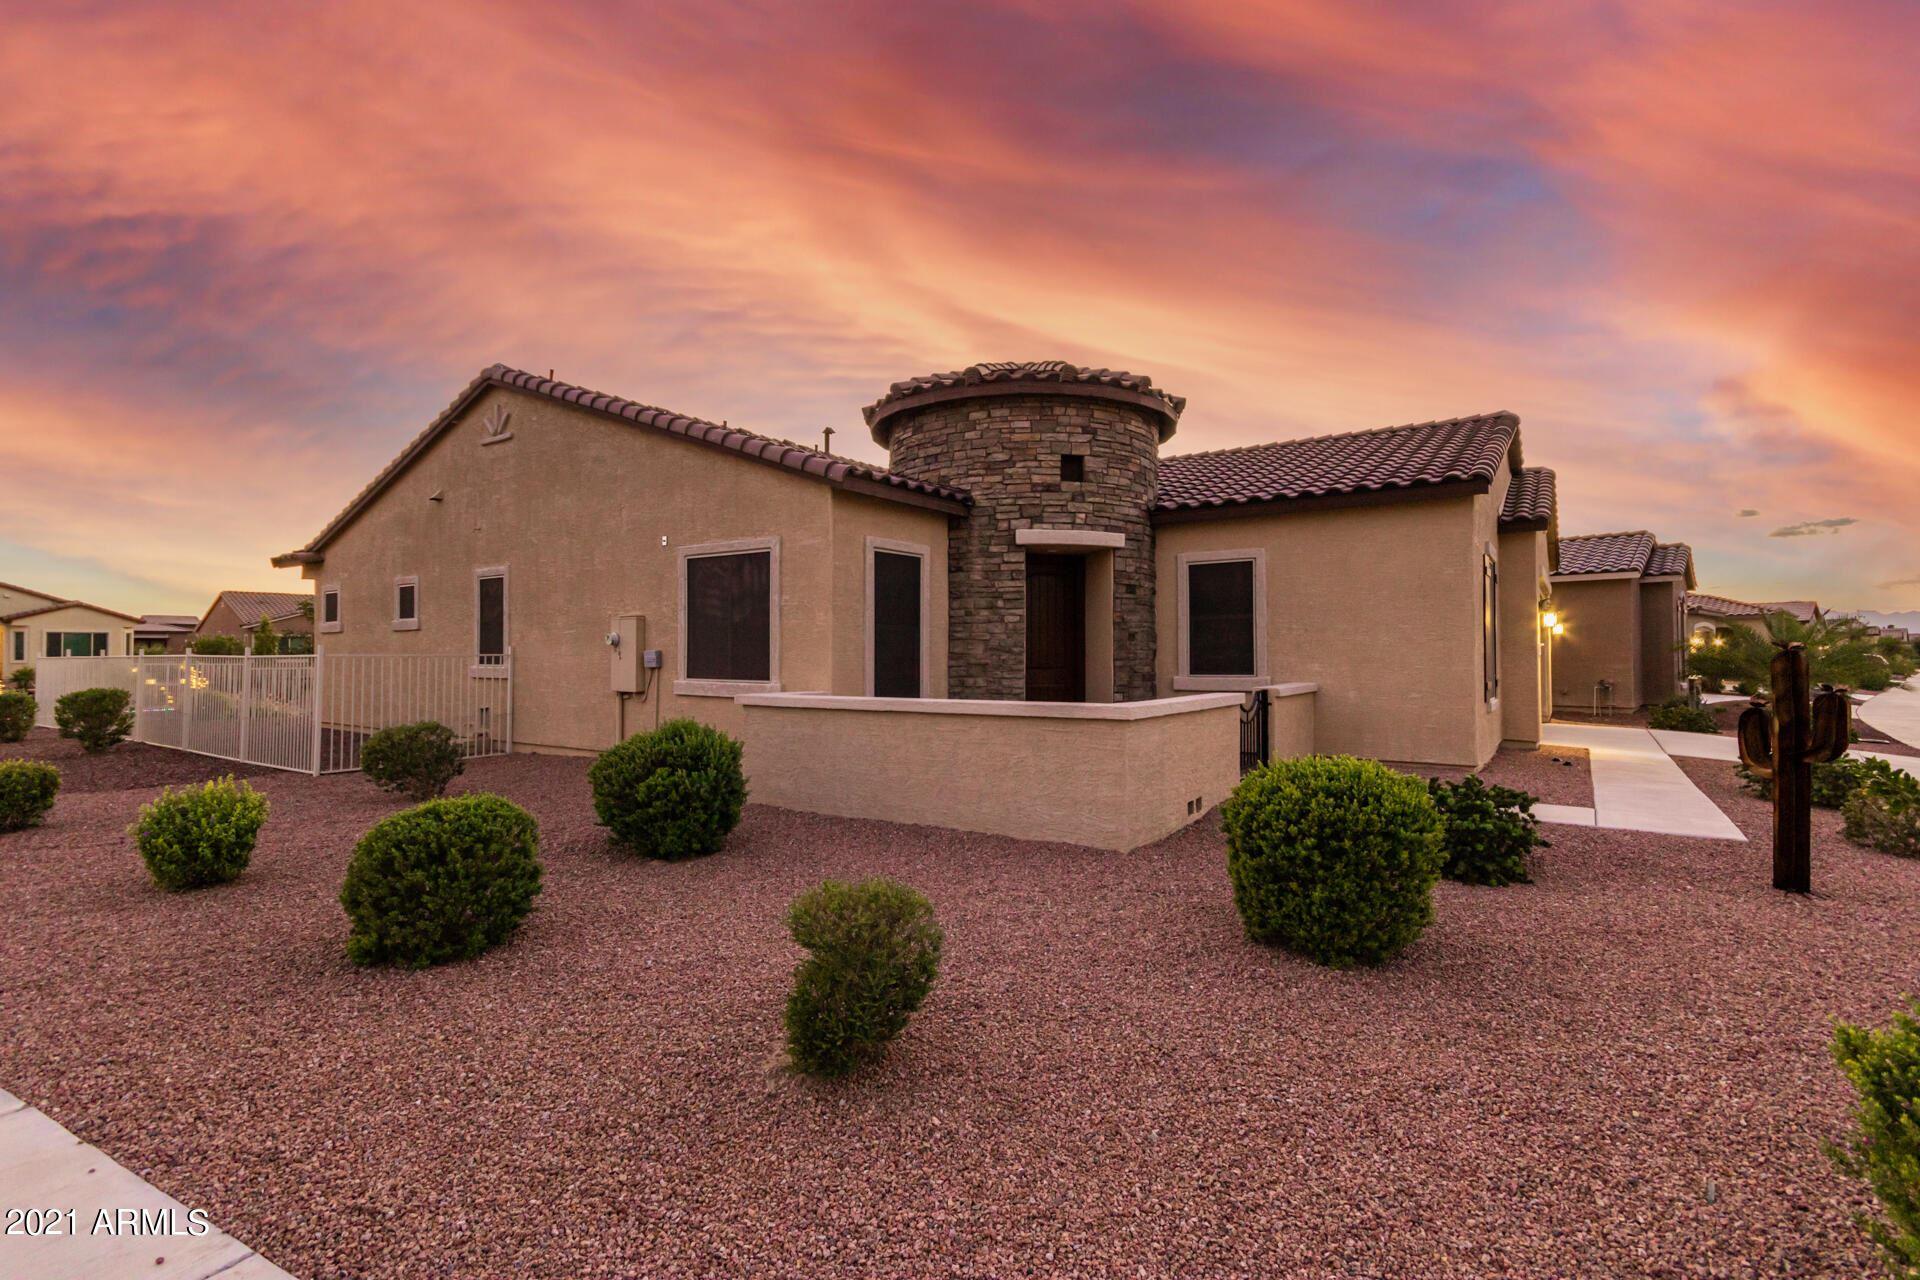 Photo for 41679 W SUMMER SUN Lane, Maricopa, AZ 85138 (MLS # 6285894)